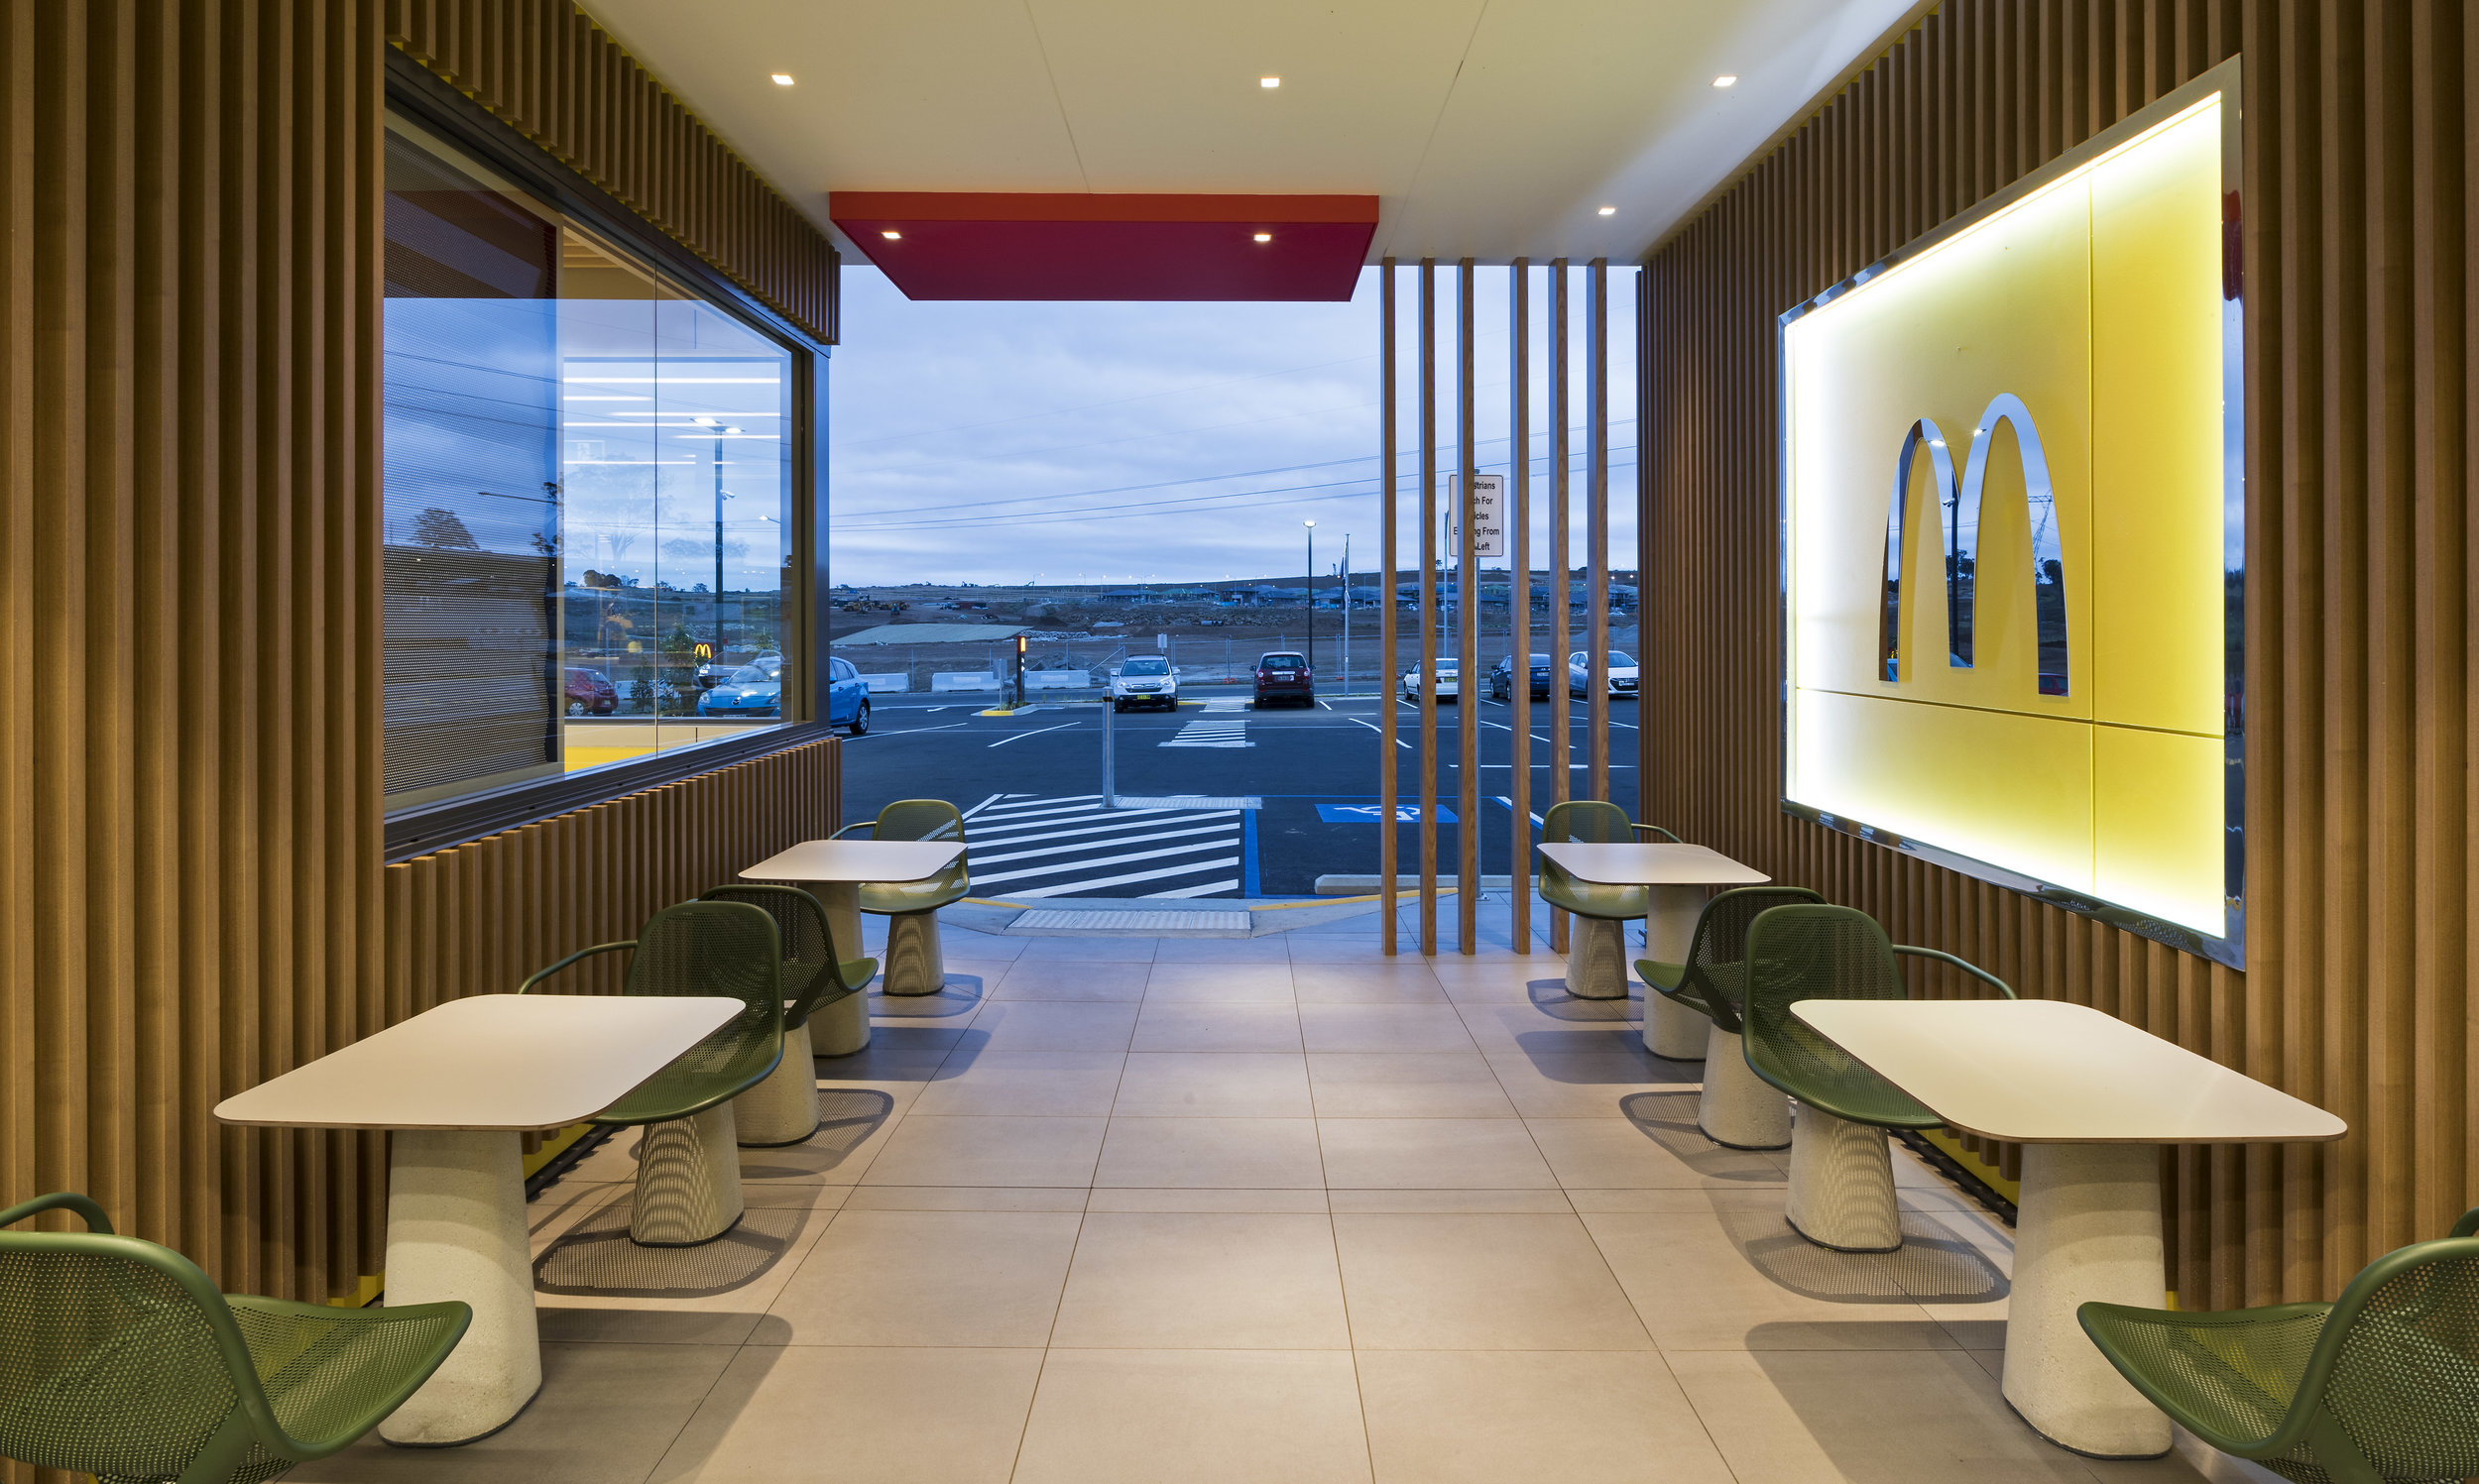 McDonald's - Emerald Hills VIC Ever Art Wood® battens - Kabebari 30x50 & 30x85 in Kuri Masame